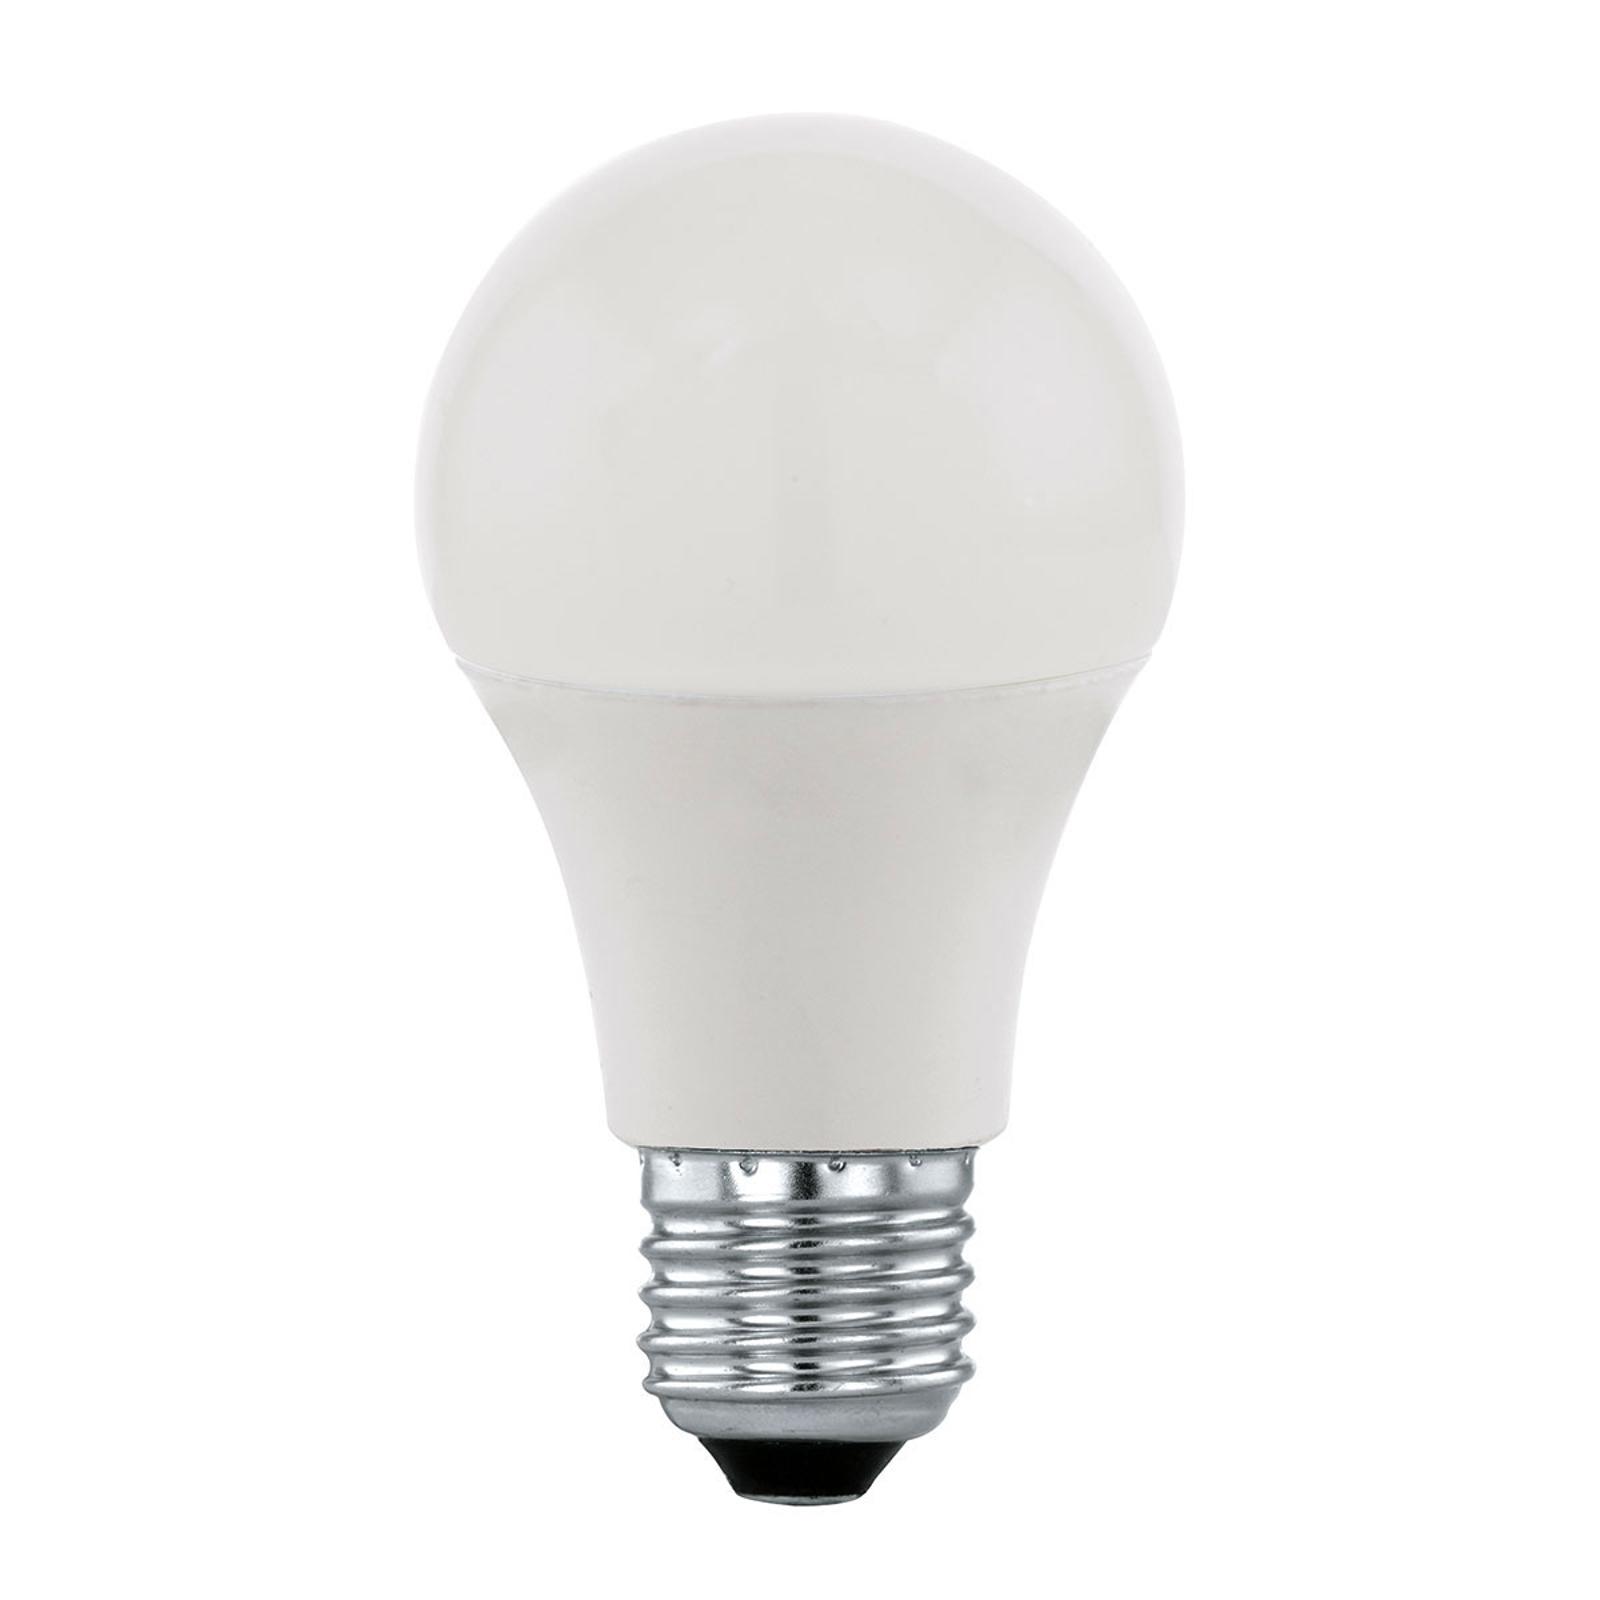 EGLO connect E27 9W LED warmweiß